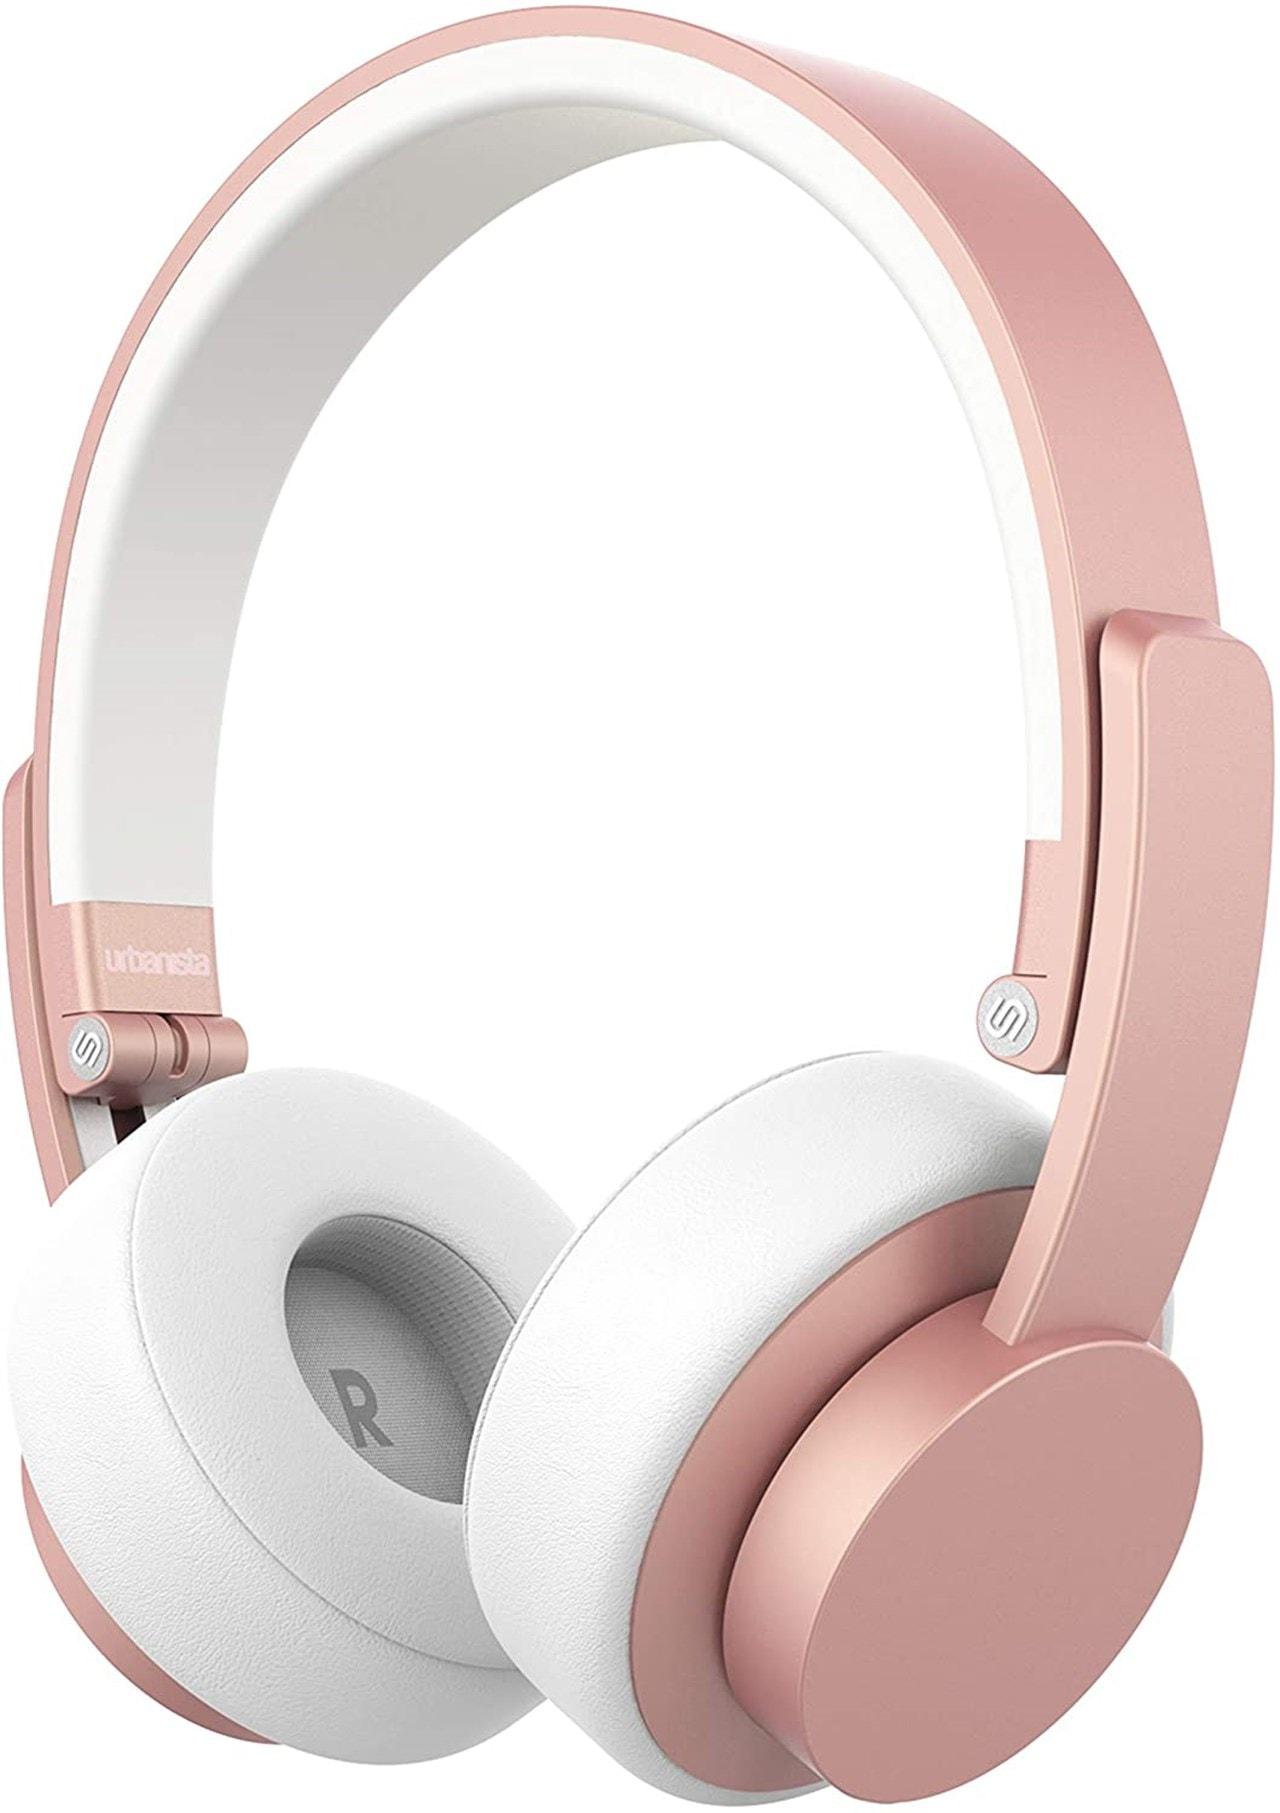 Urbanista Seattle Rose Gold Bluetooth Headphones - 1